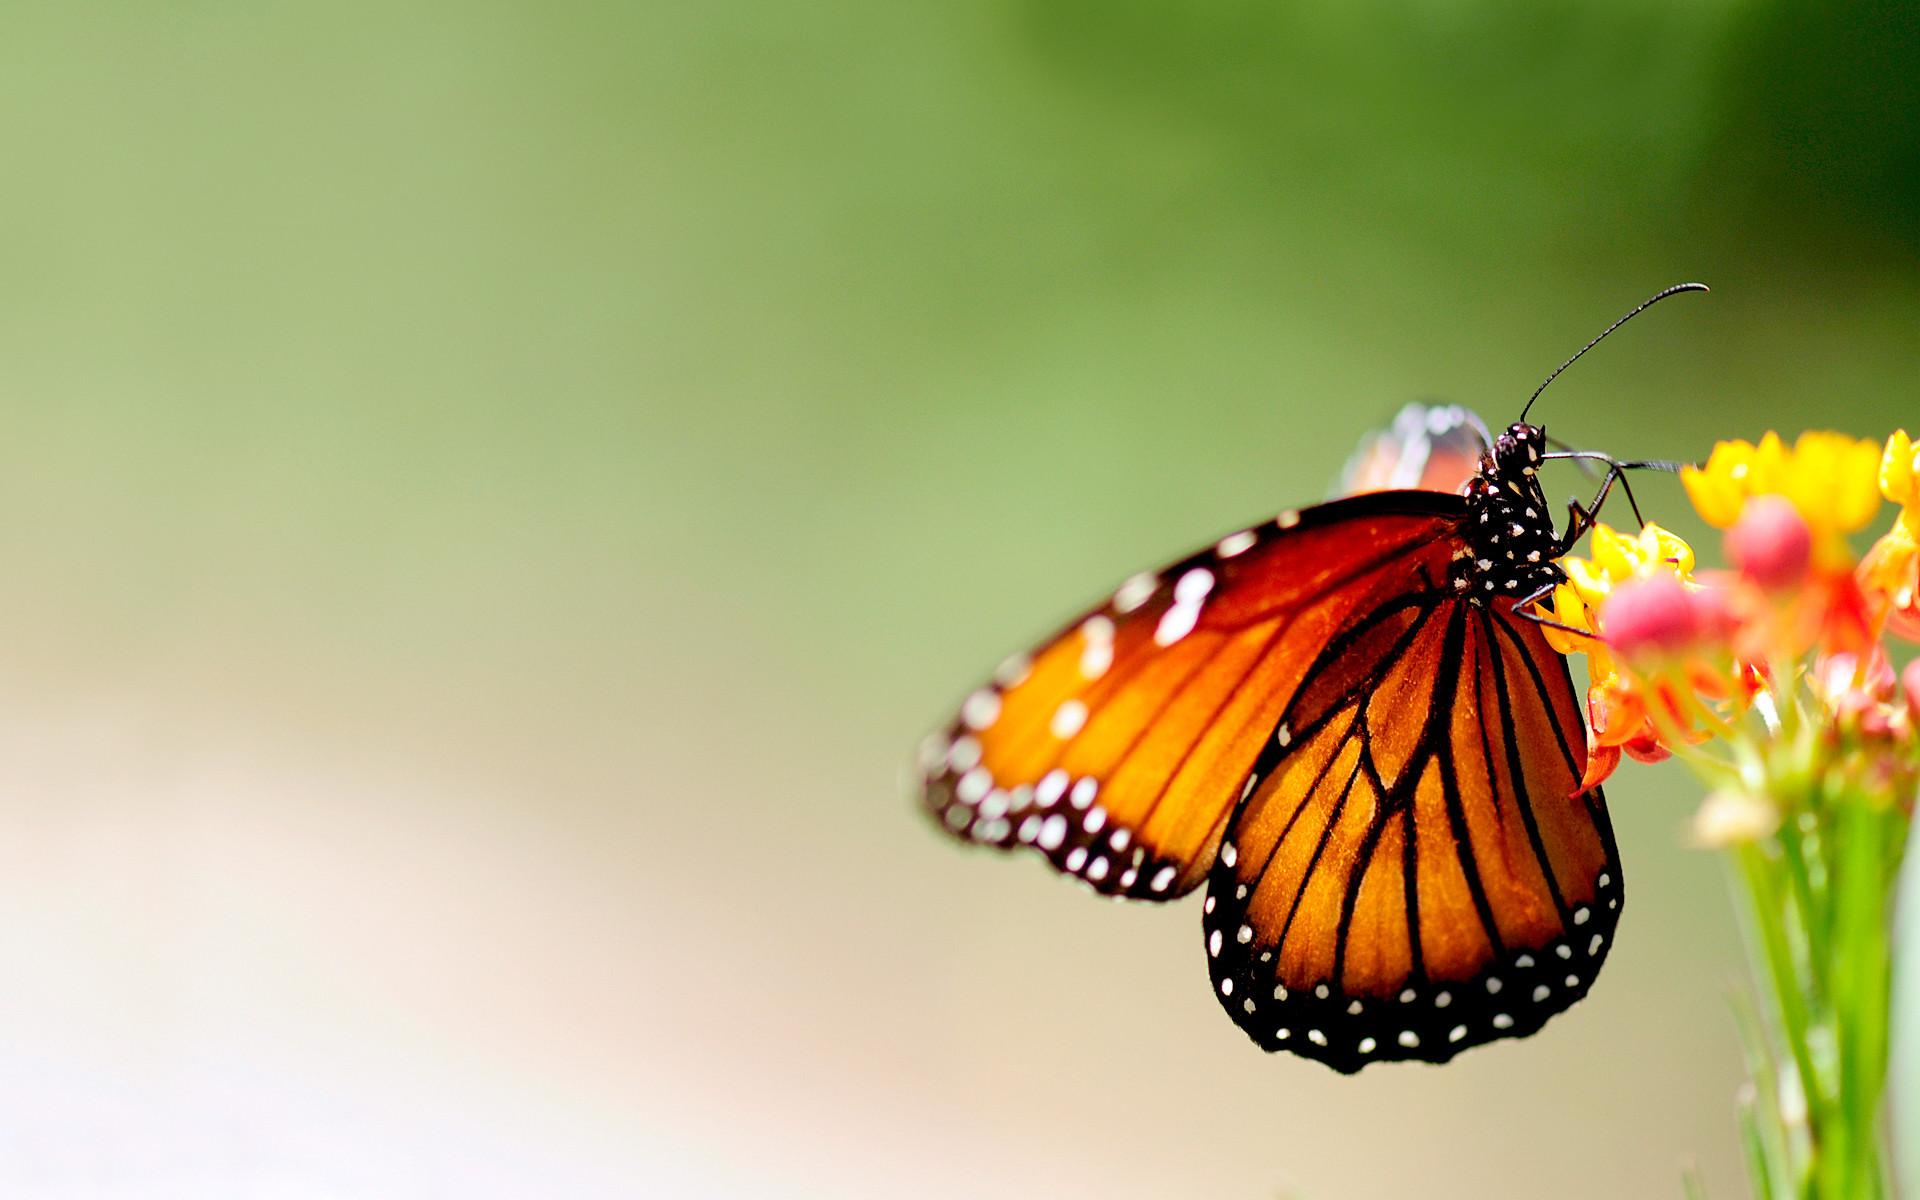 Res: 1920x1200, Butterfly Wallpaper Desktop Background